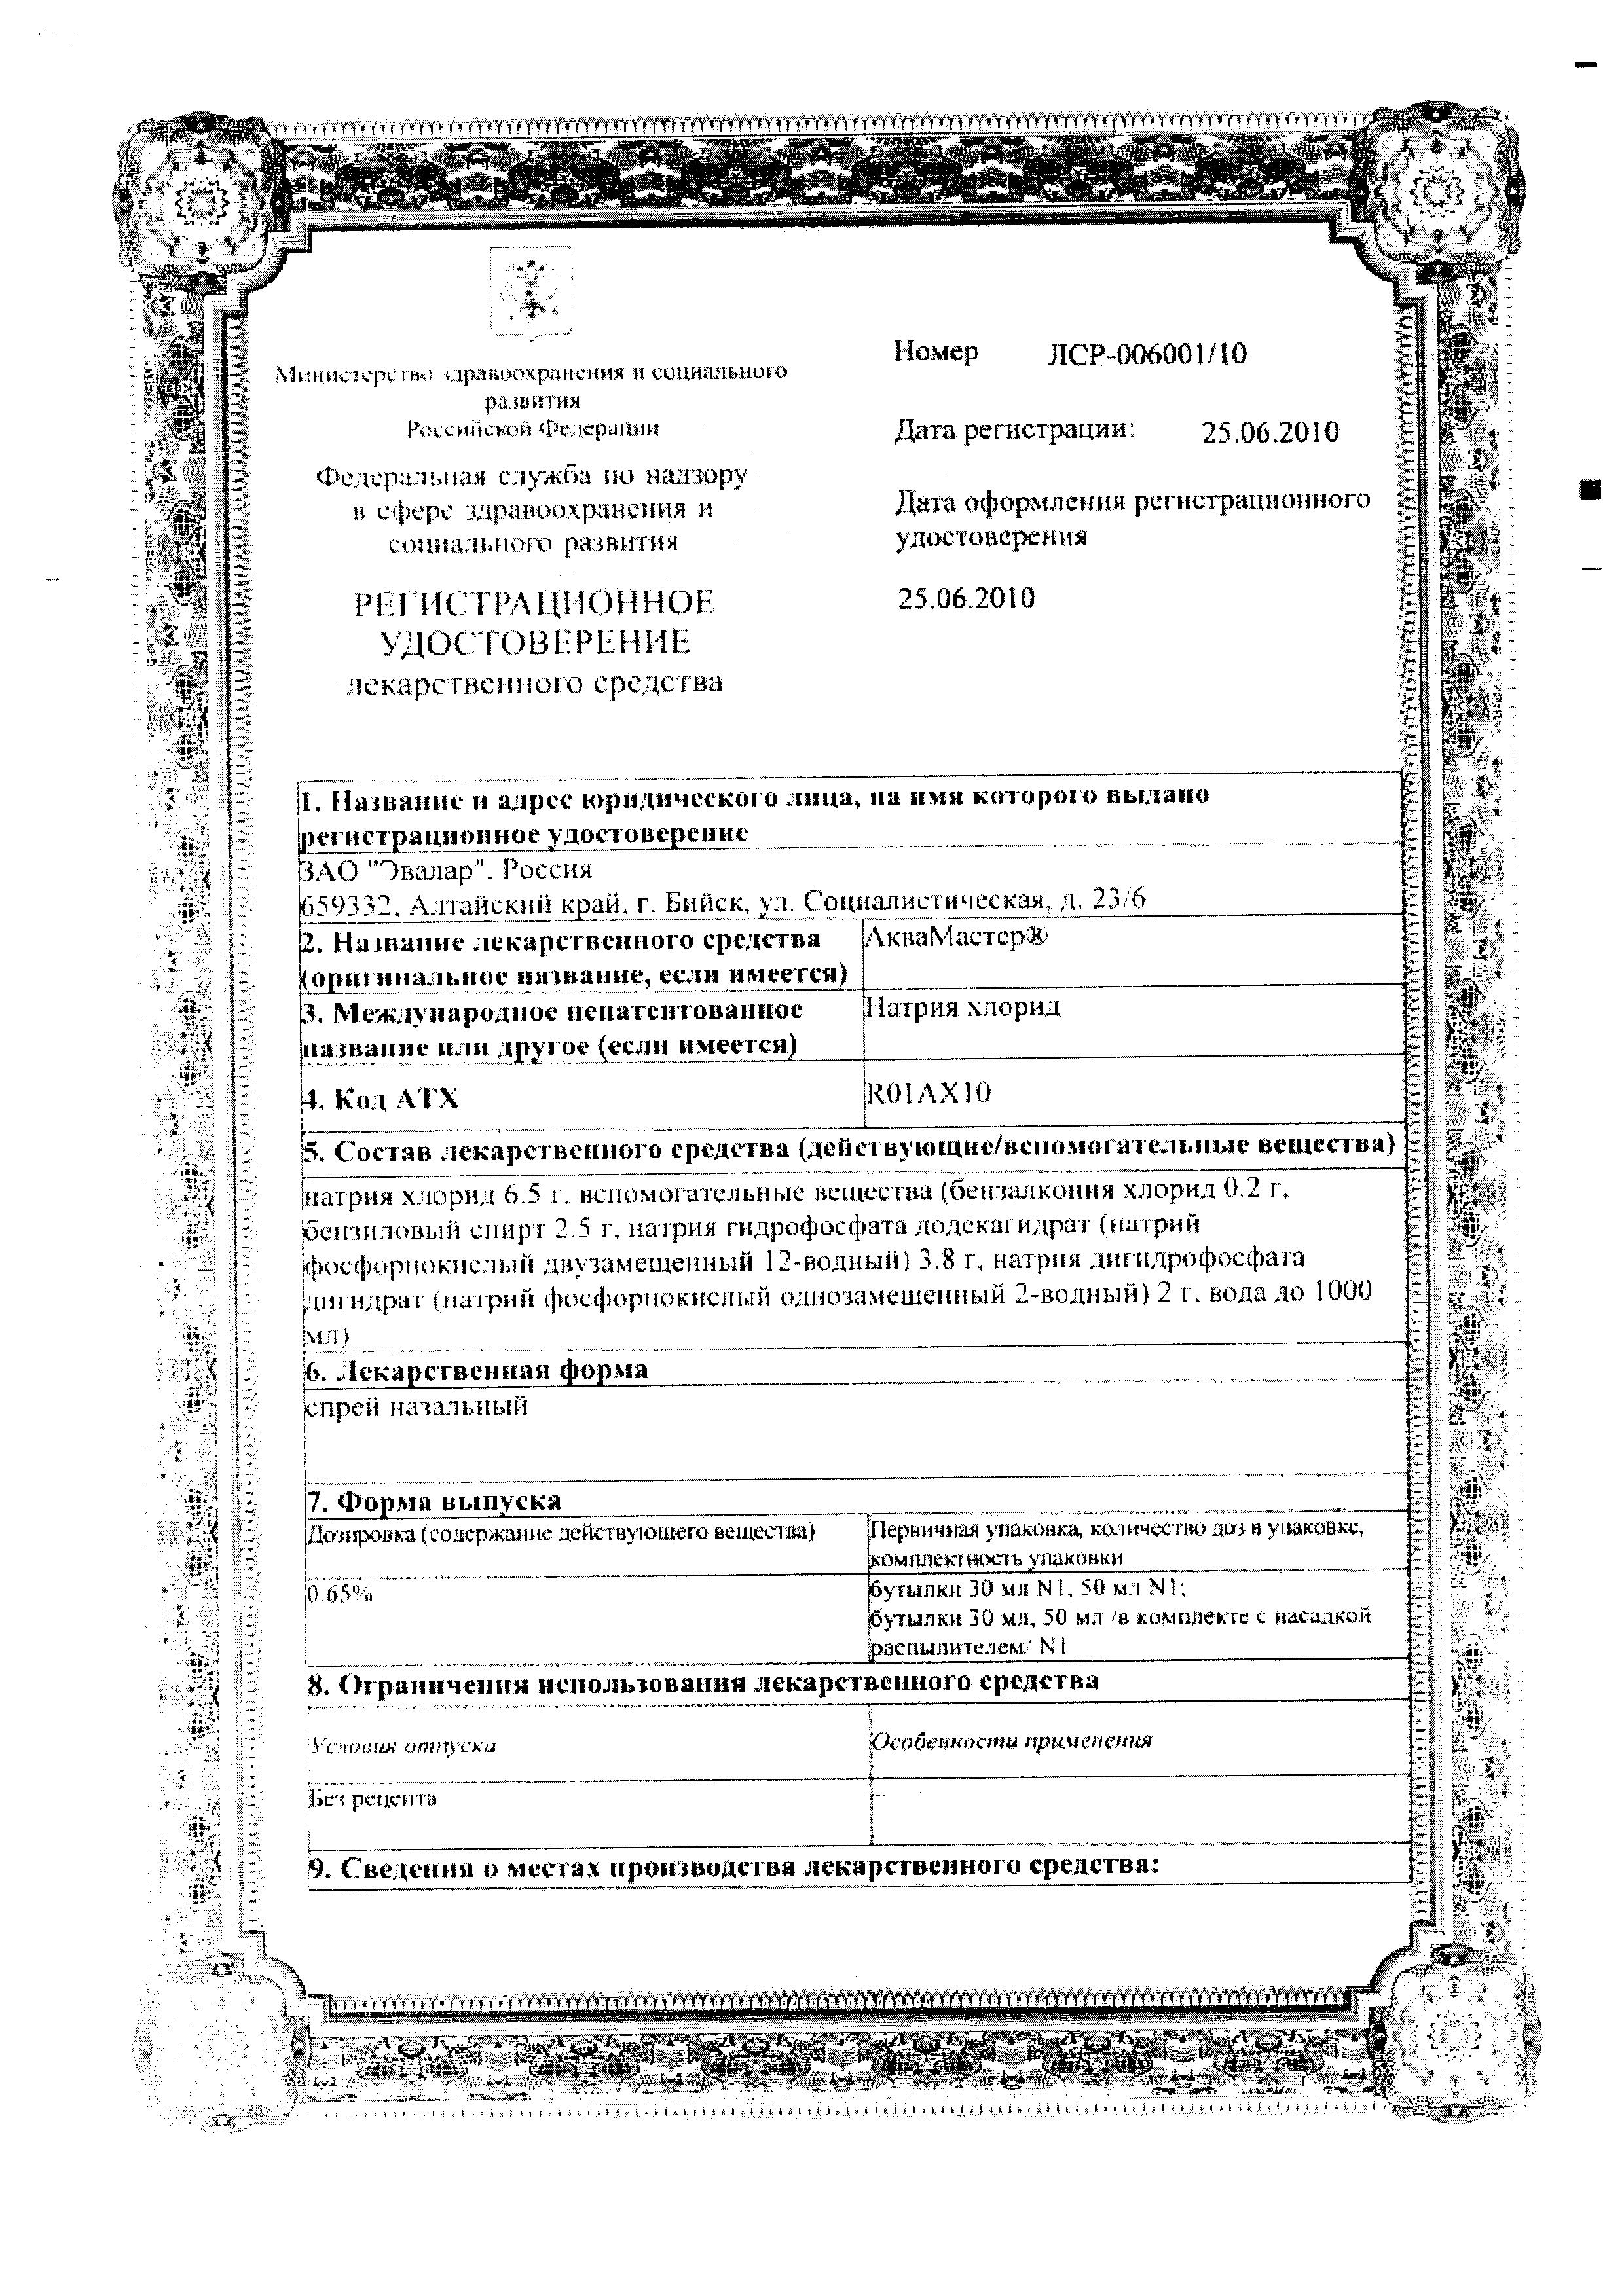 АкваМастер сертификат